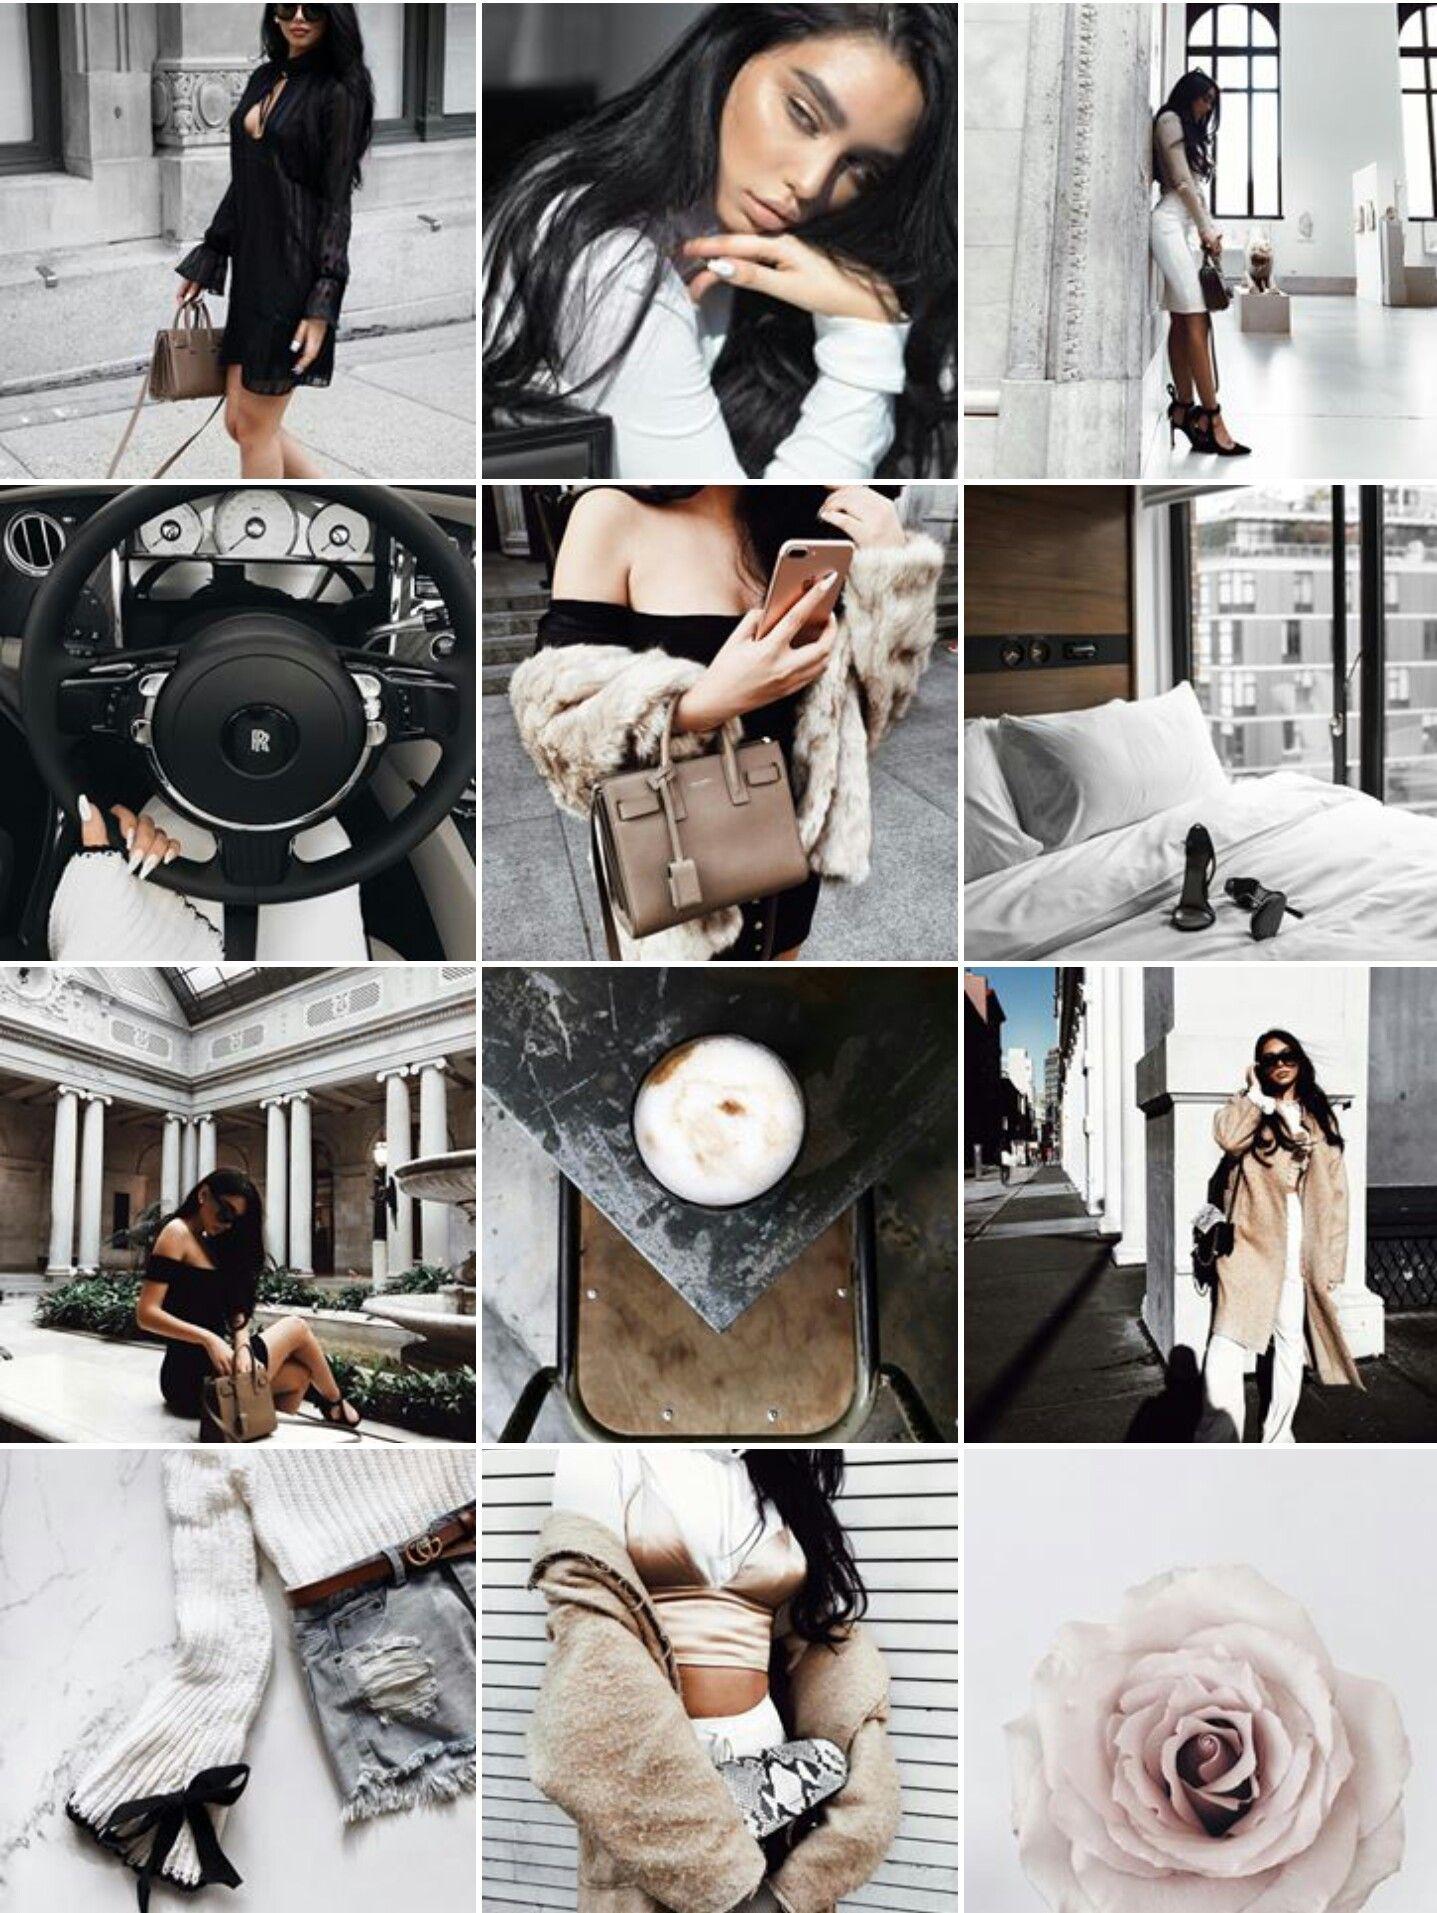 Pin By Olga Sidorenko On Photography Instagram Feed Theme Layout